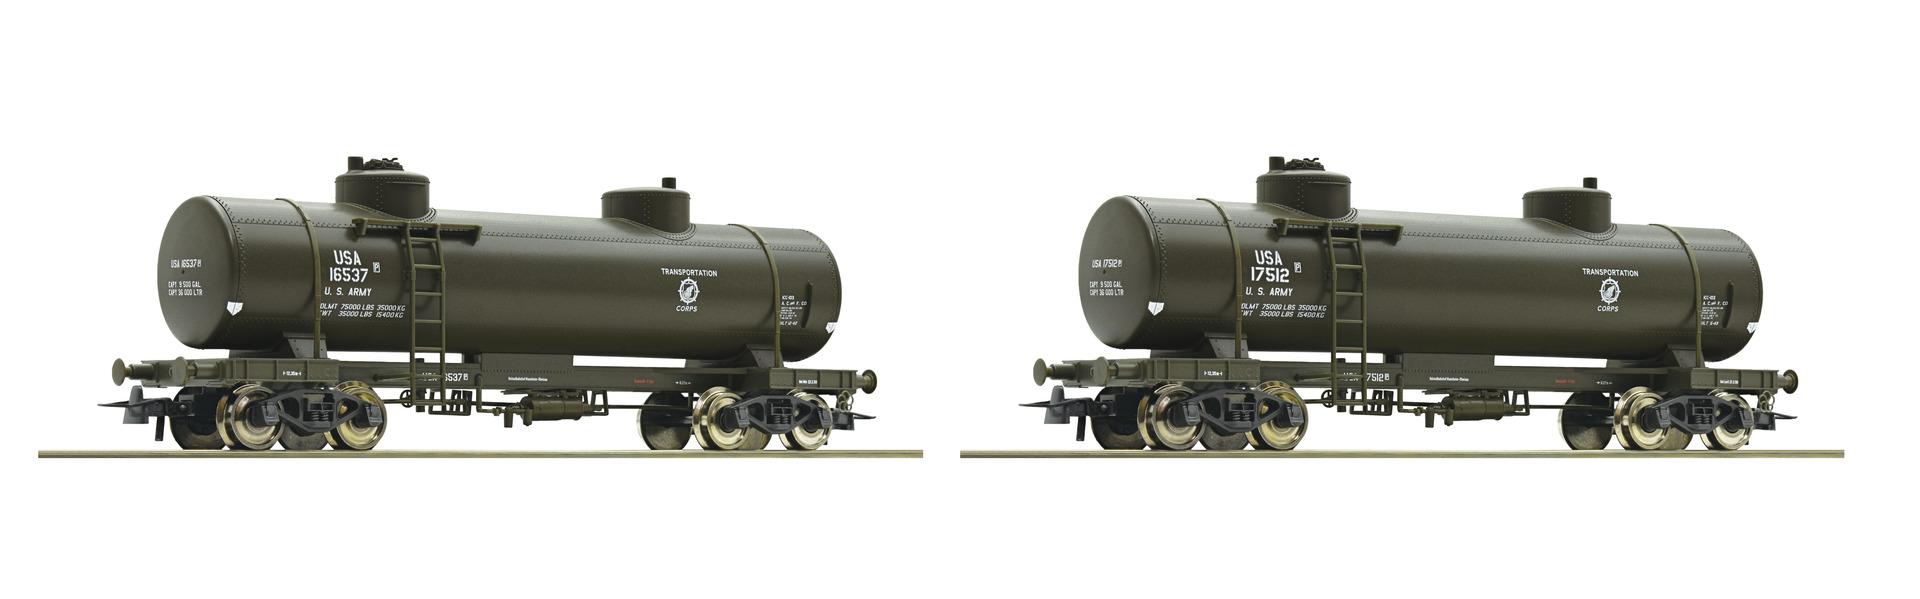 Roco67117 USTA tankcar 2 car set